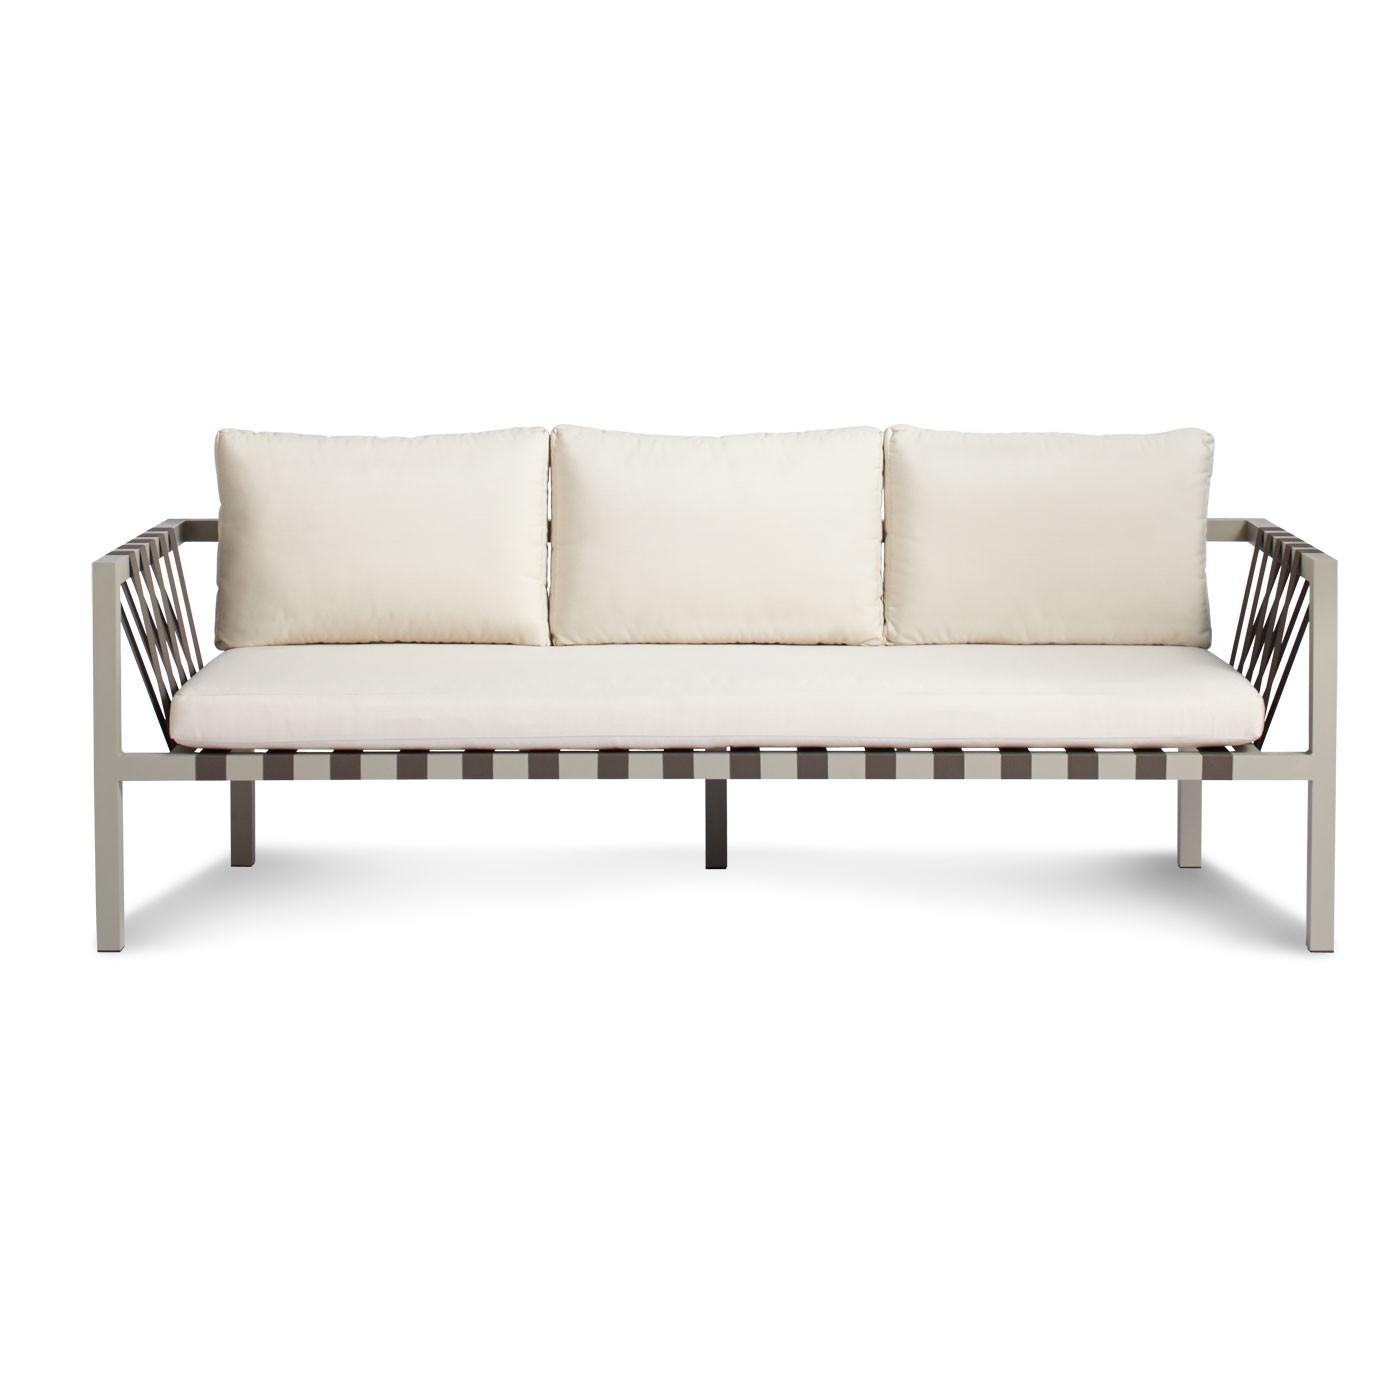 Jibe Outdoor 3 Seat Sofa - Modern Outdoor Sofas | Blu Dot in Modern 3 Seater Sofas